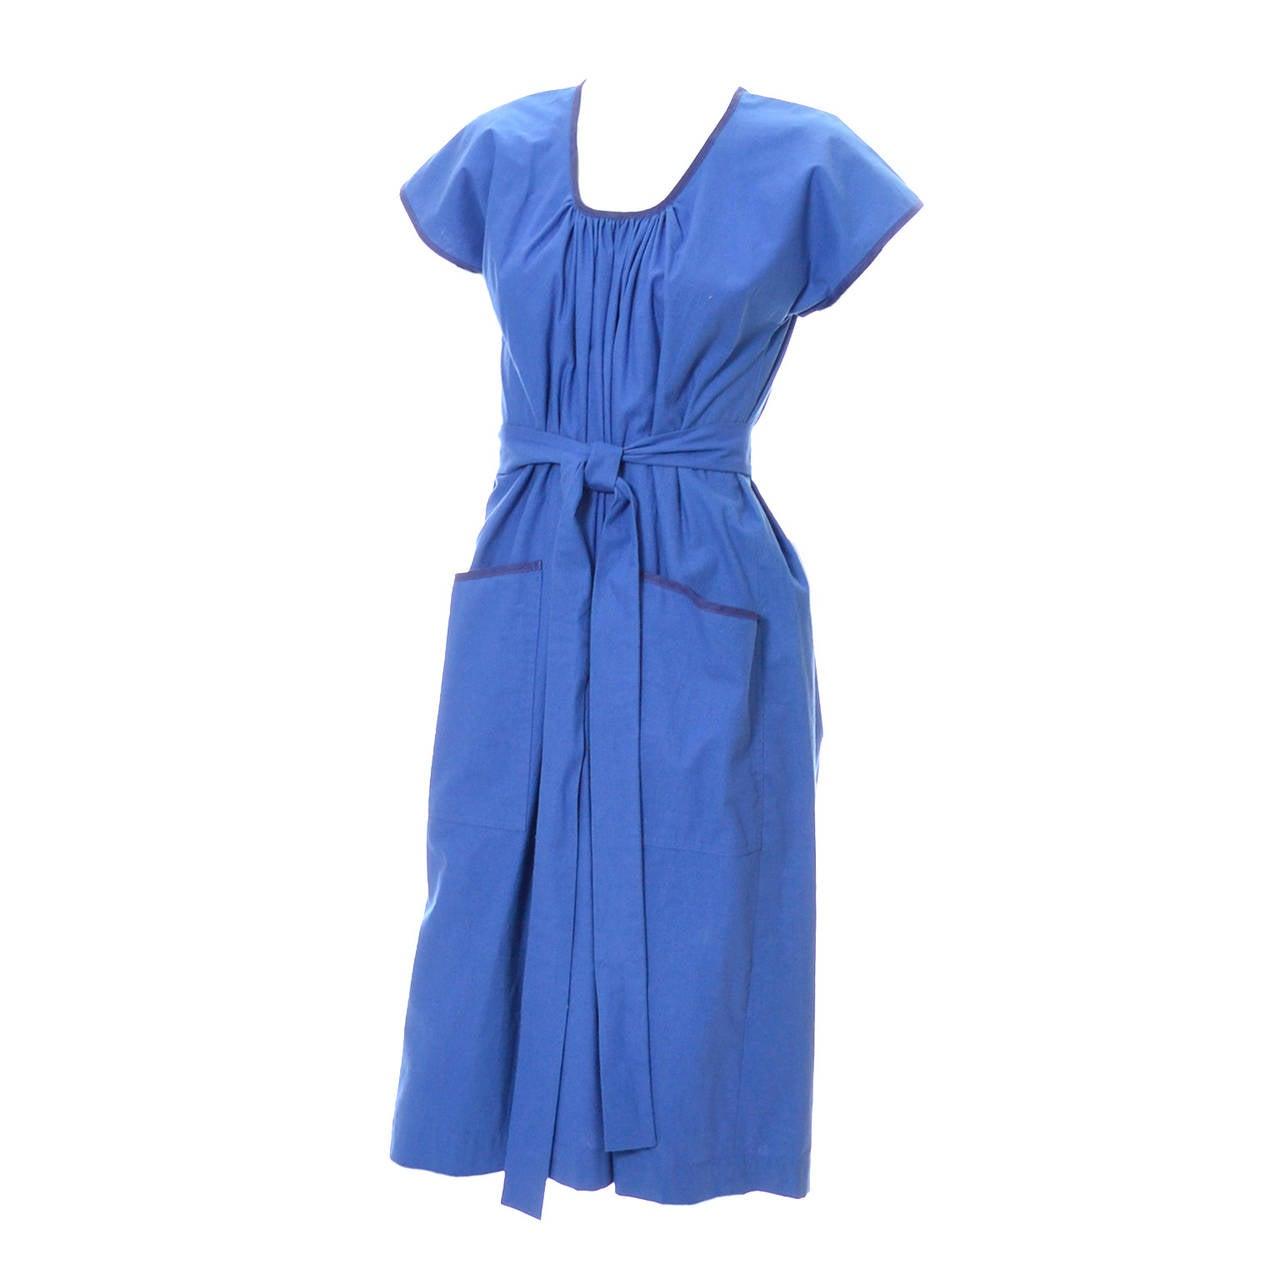 Yves Saint Laurent Rive Gauche YSL Vintage Dress 1970s Blue Peasant As New